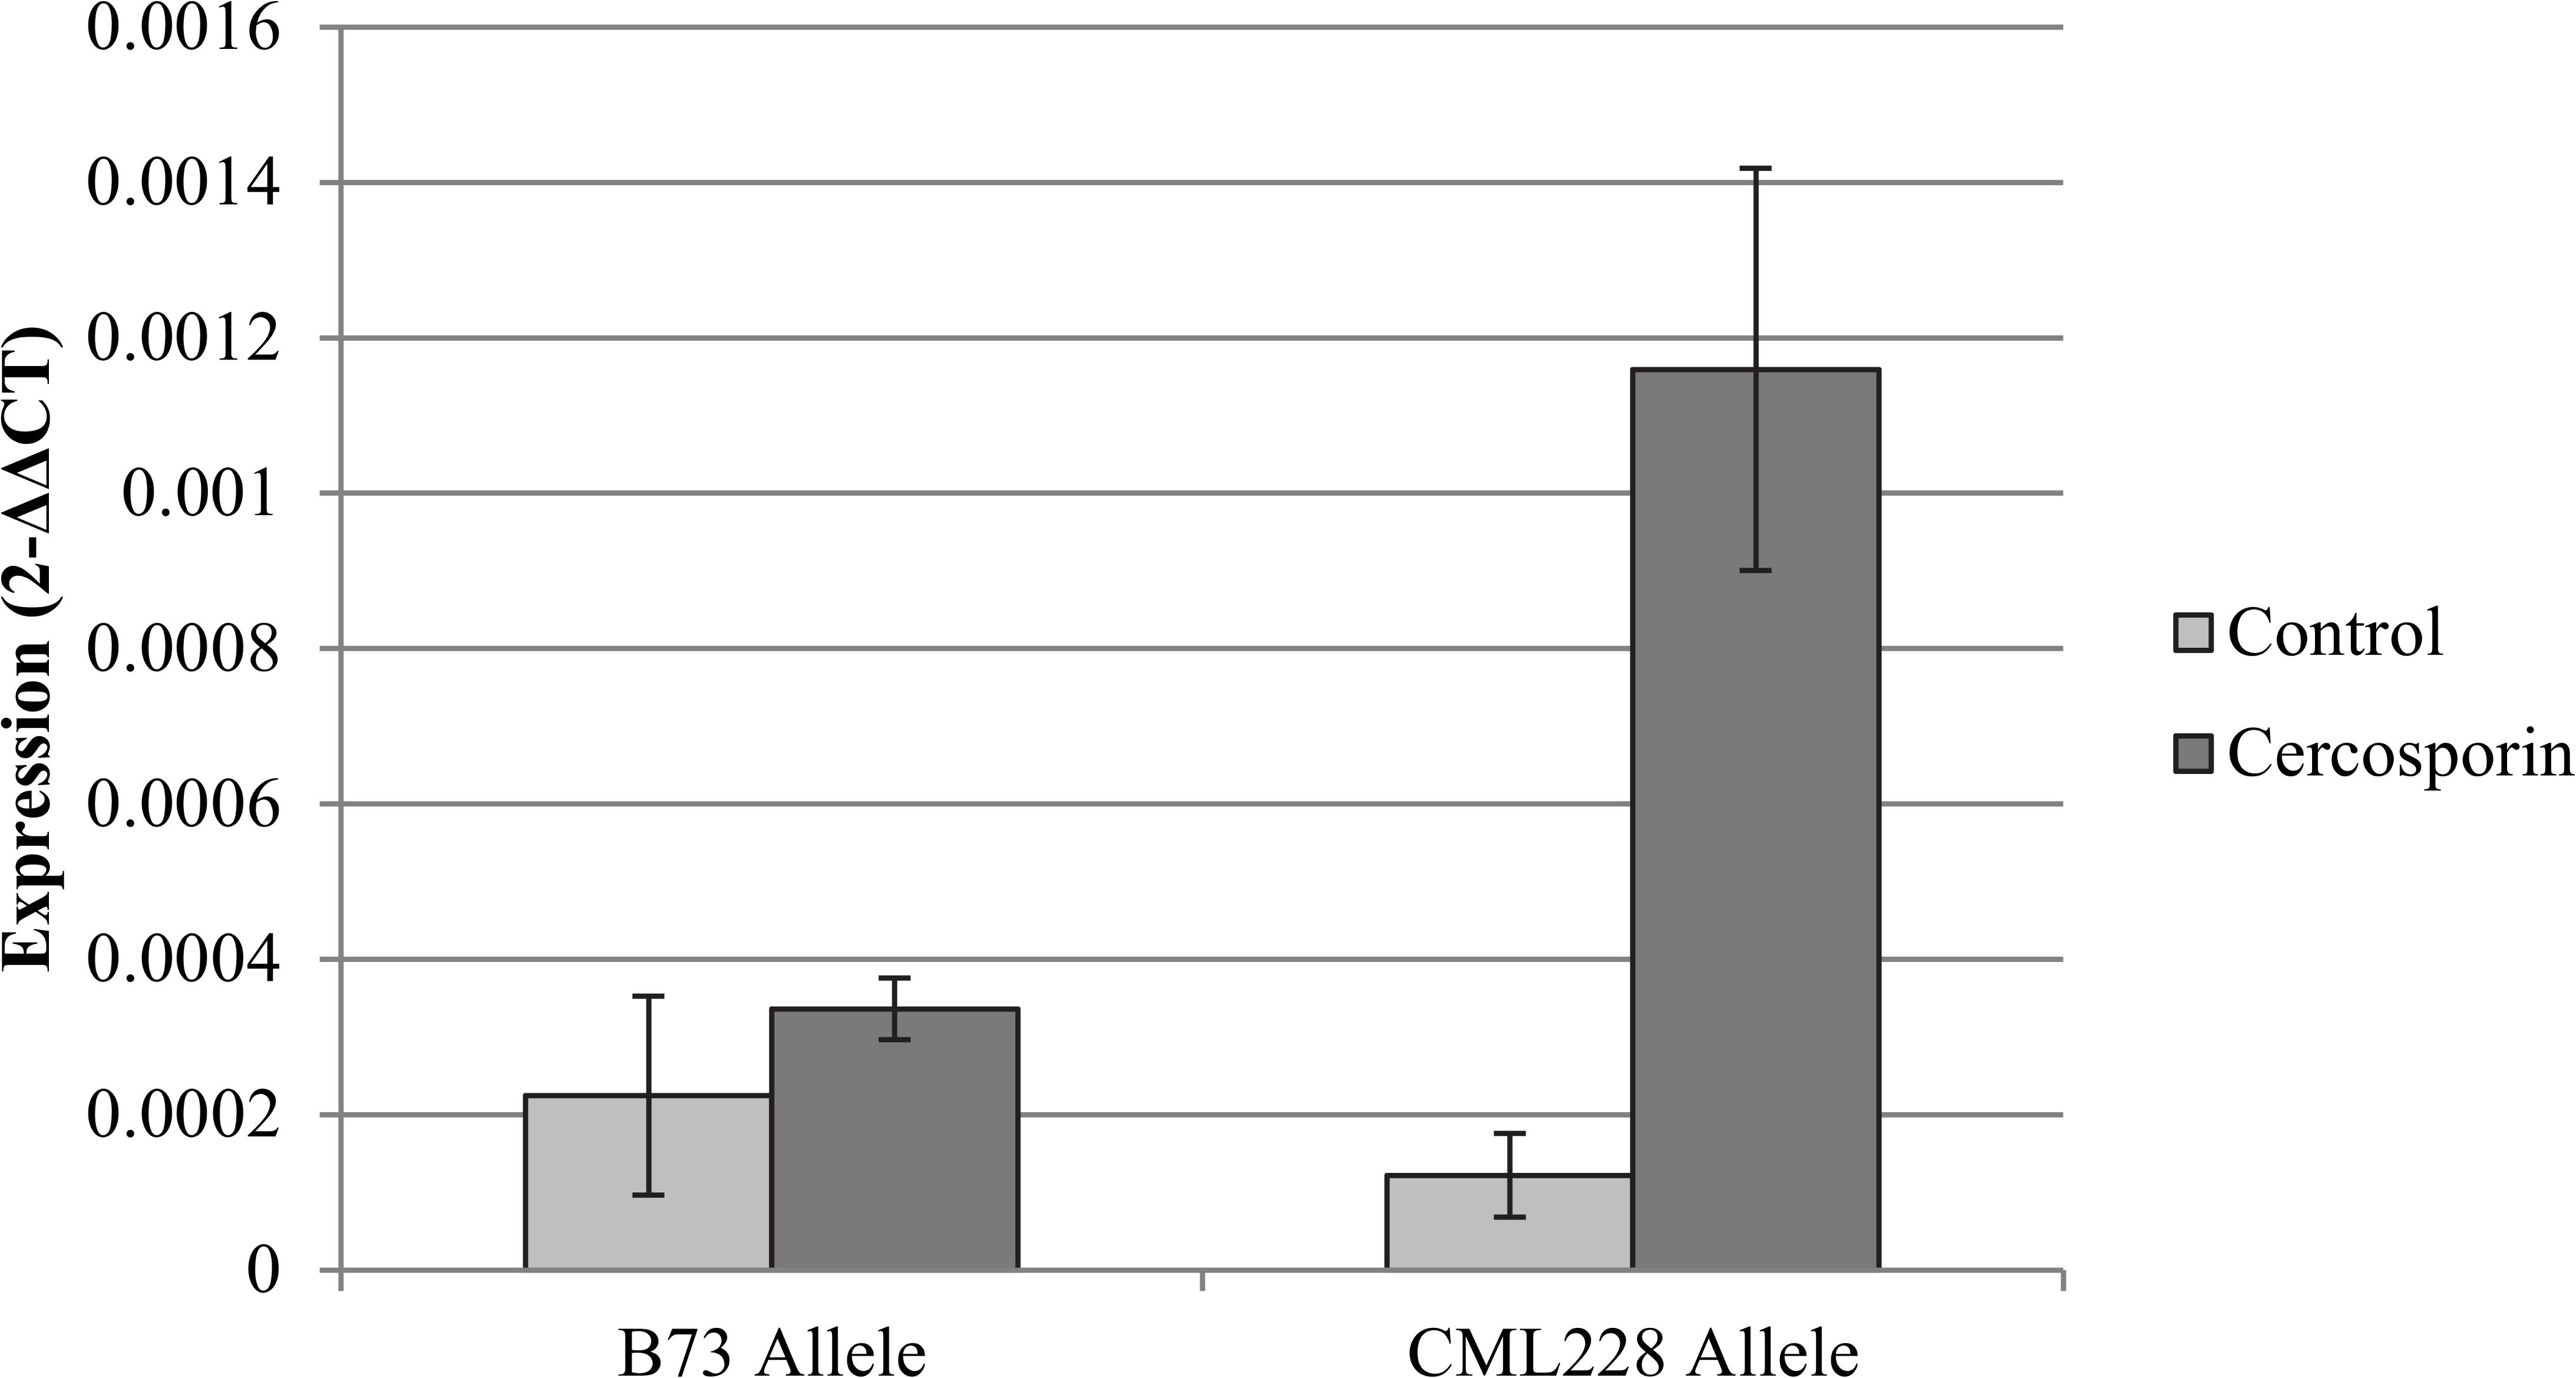 Analysis of flavin-monooxygenase expression at qGLS1.04.